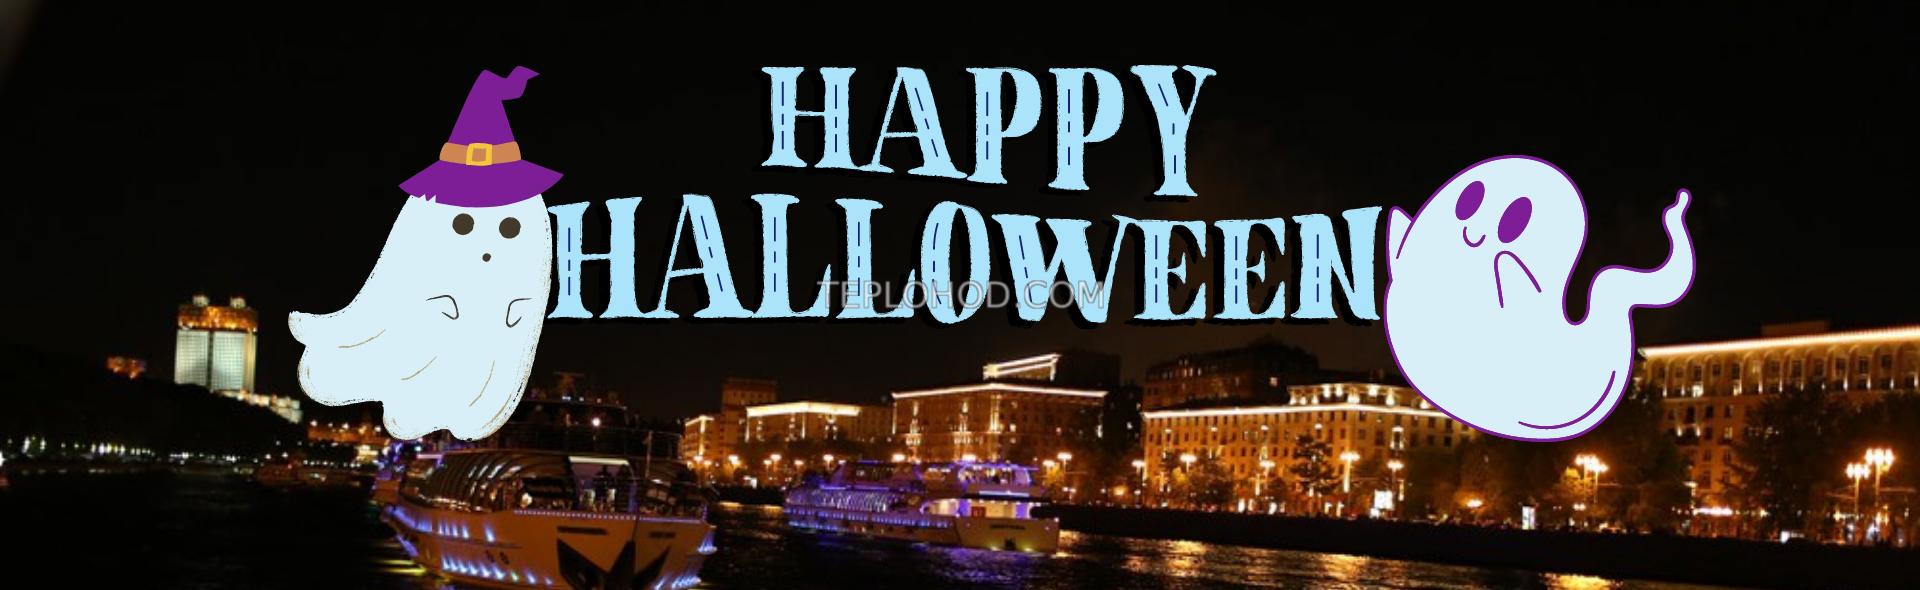 "Вечеринка ""Хэллоуин в стиле 90-х"" с прогулкой на теплоходе по Москве-реке"